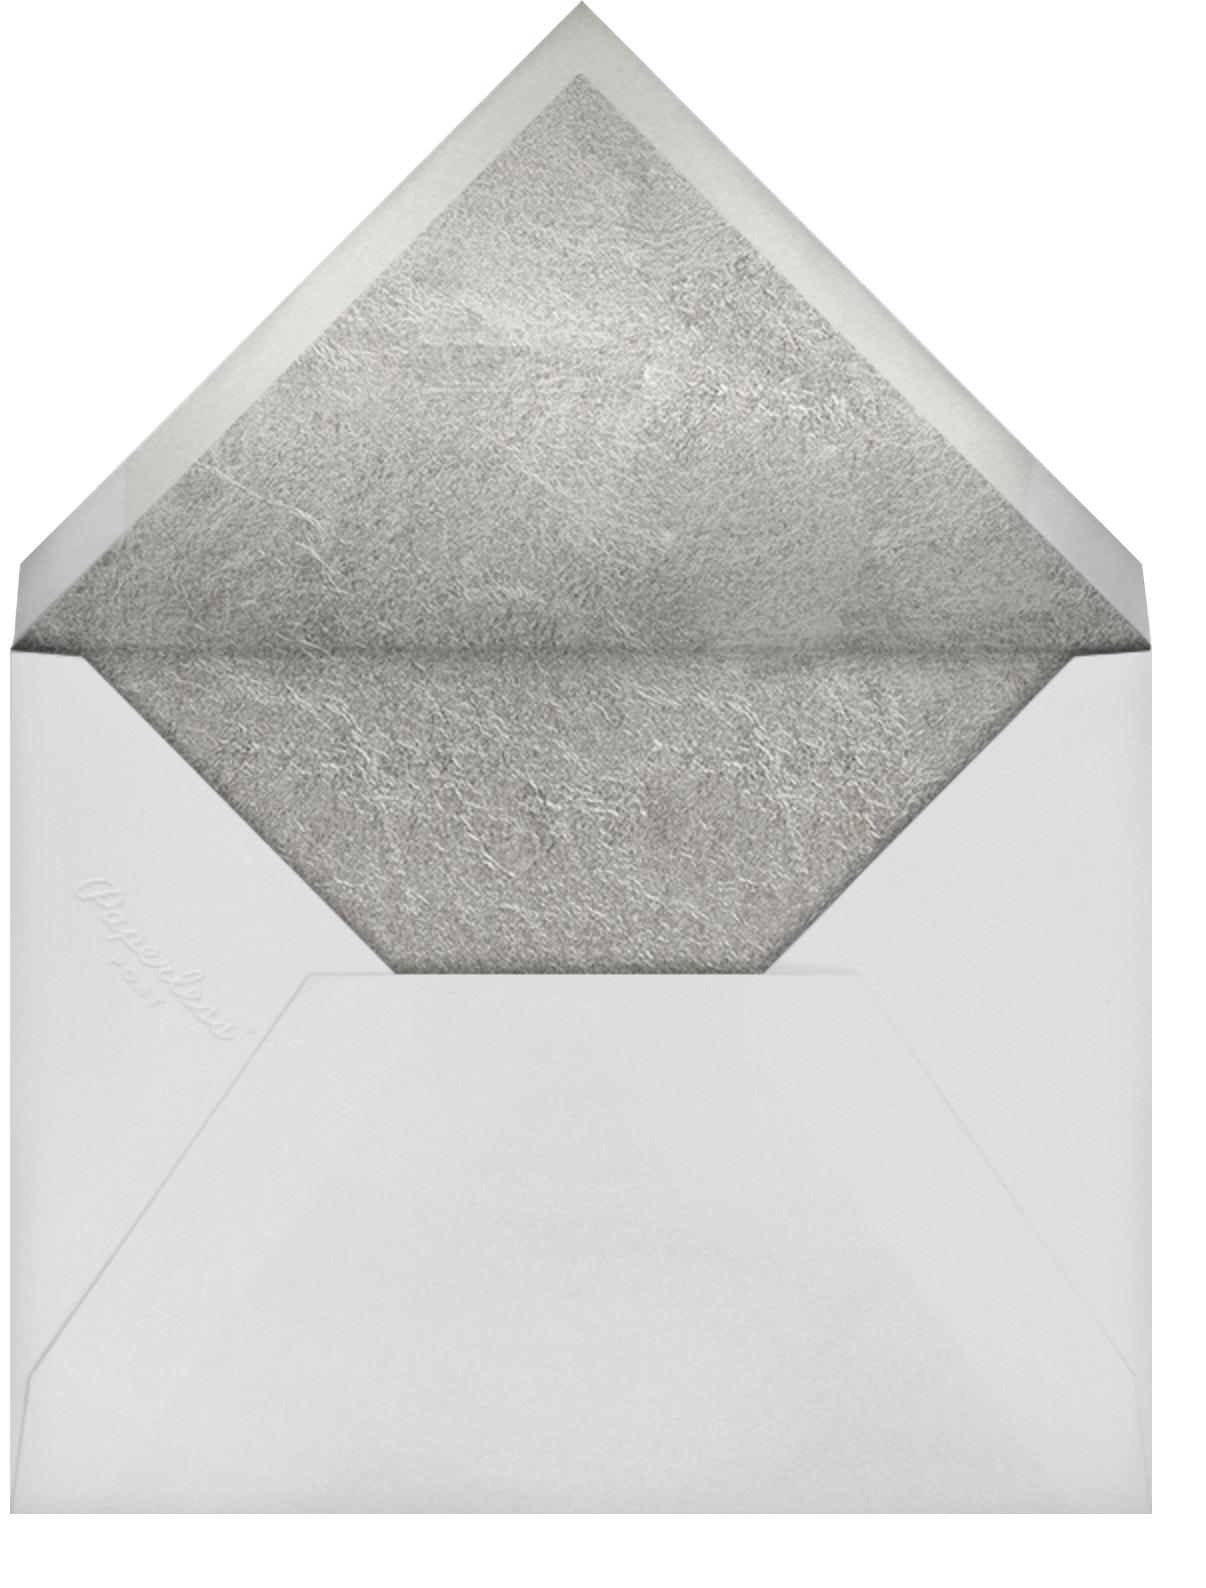 Garde (Invitation) - Silver - Kelly Wearstler - All - envelope back